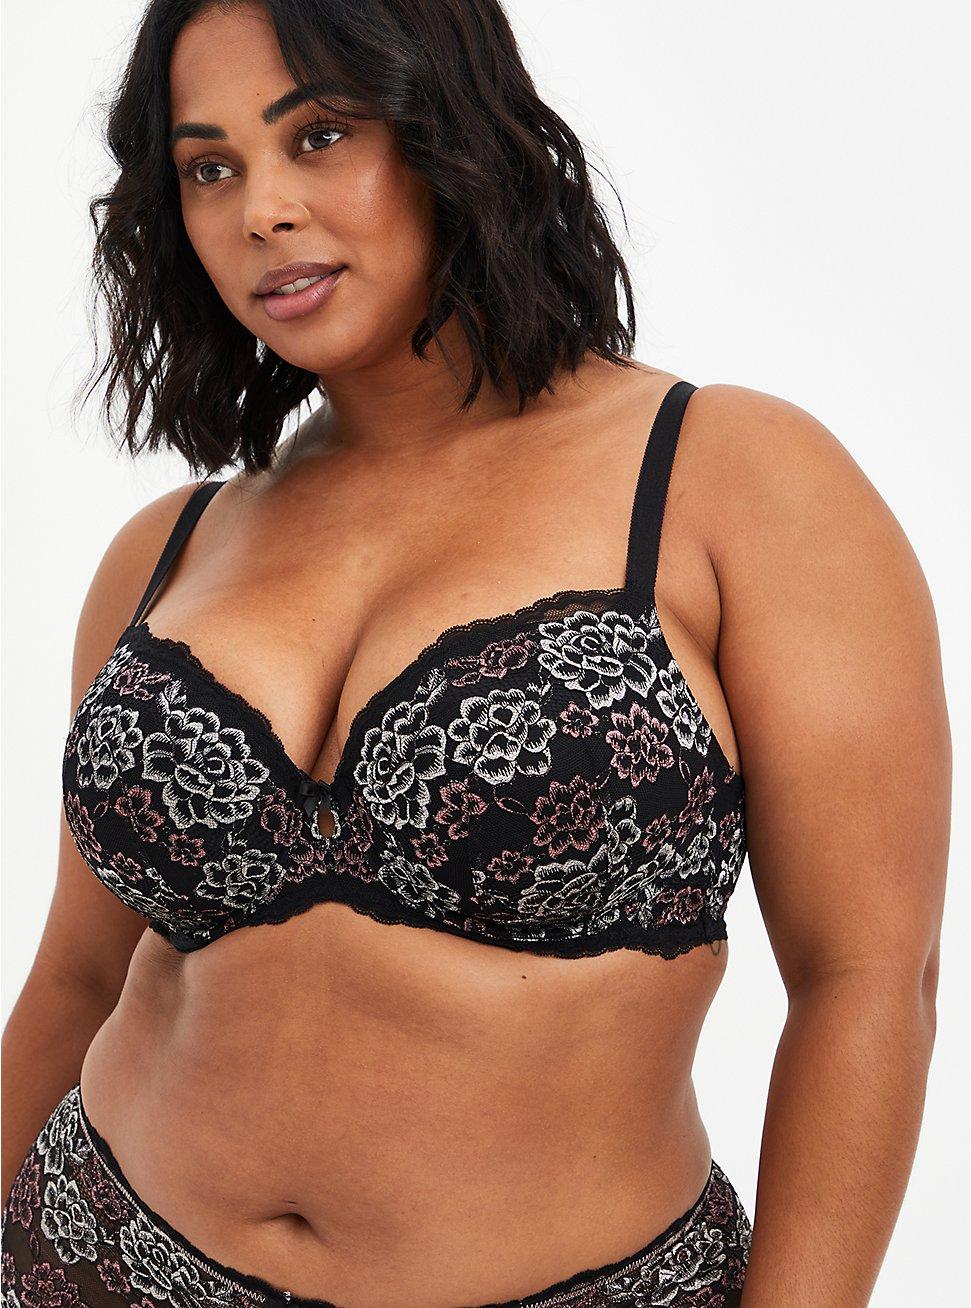 Lightly Lined T-Shirt Bra - Lace Black & Pink, , hi-res